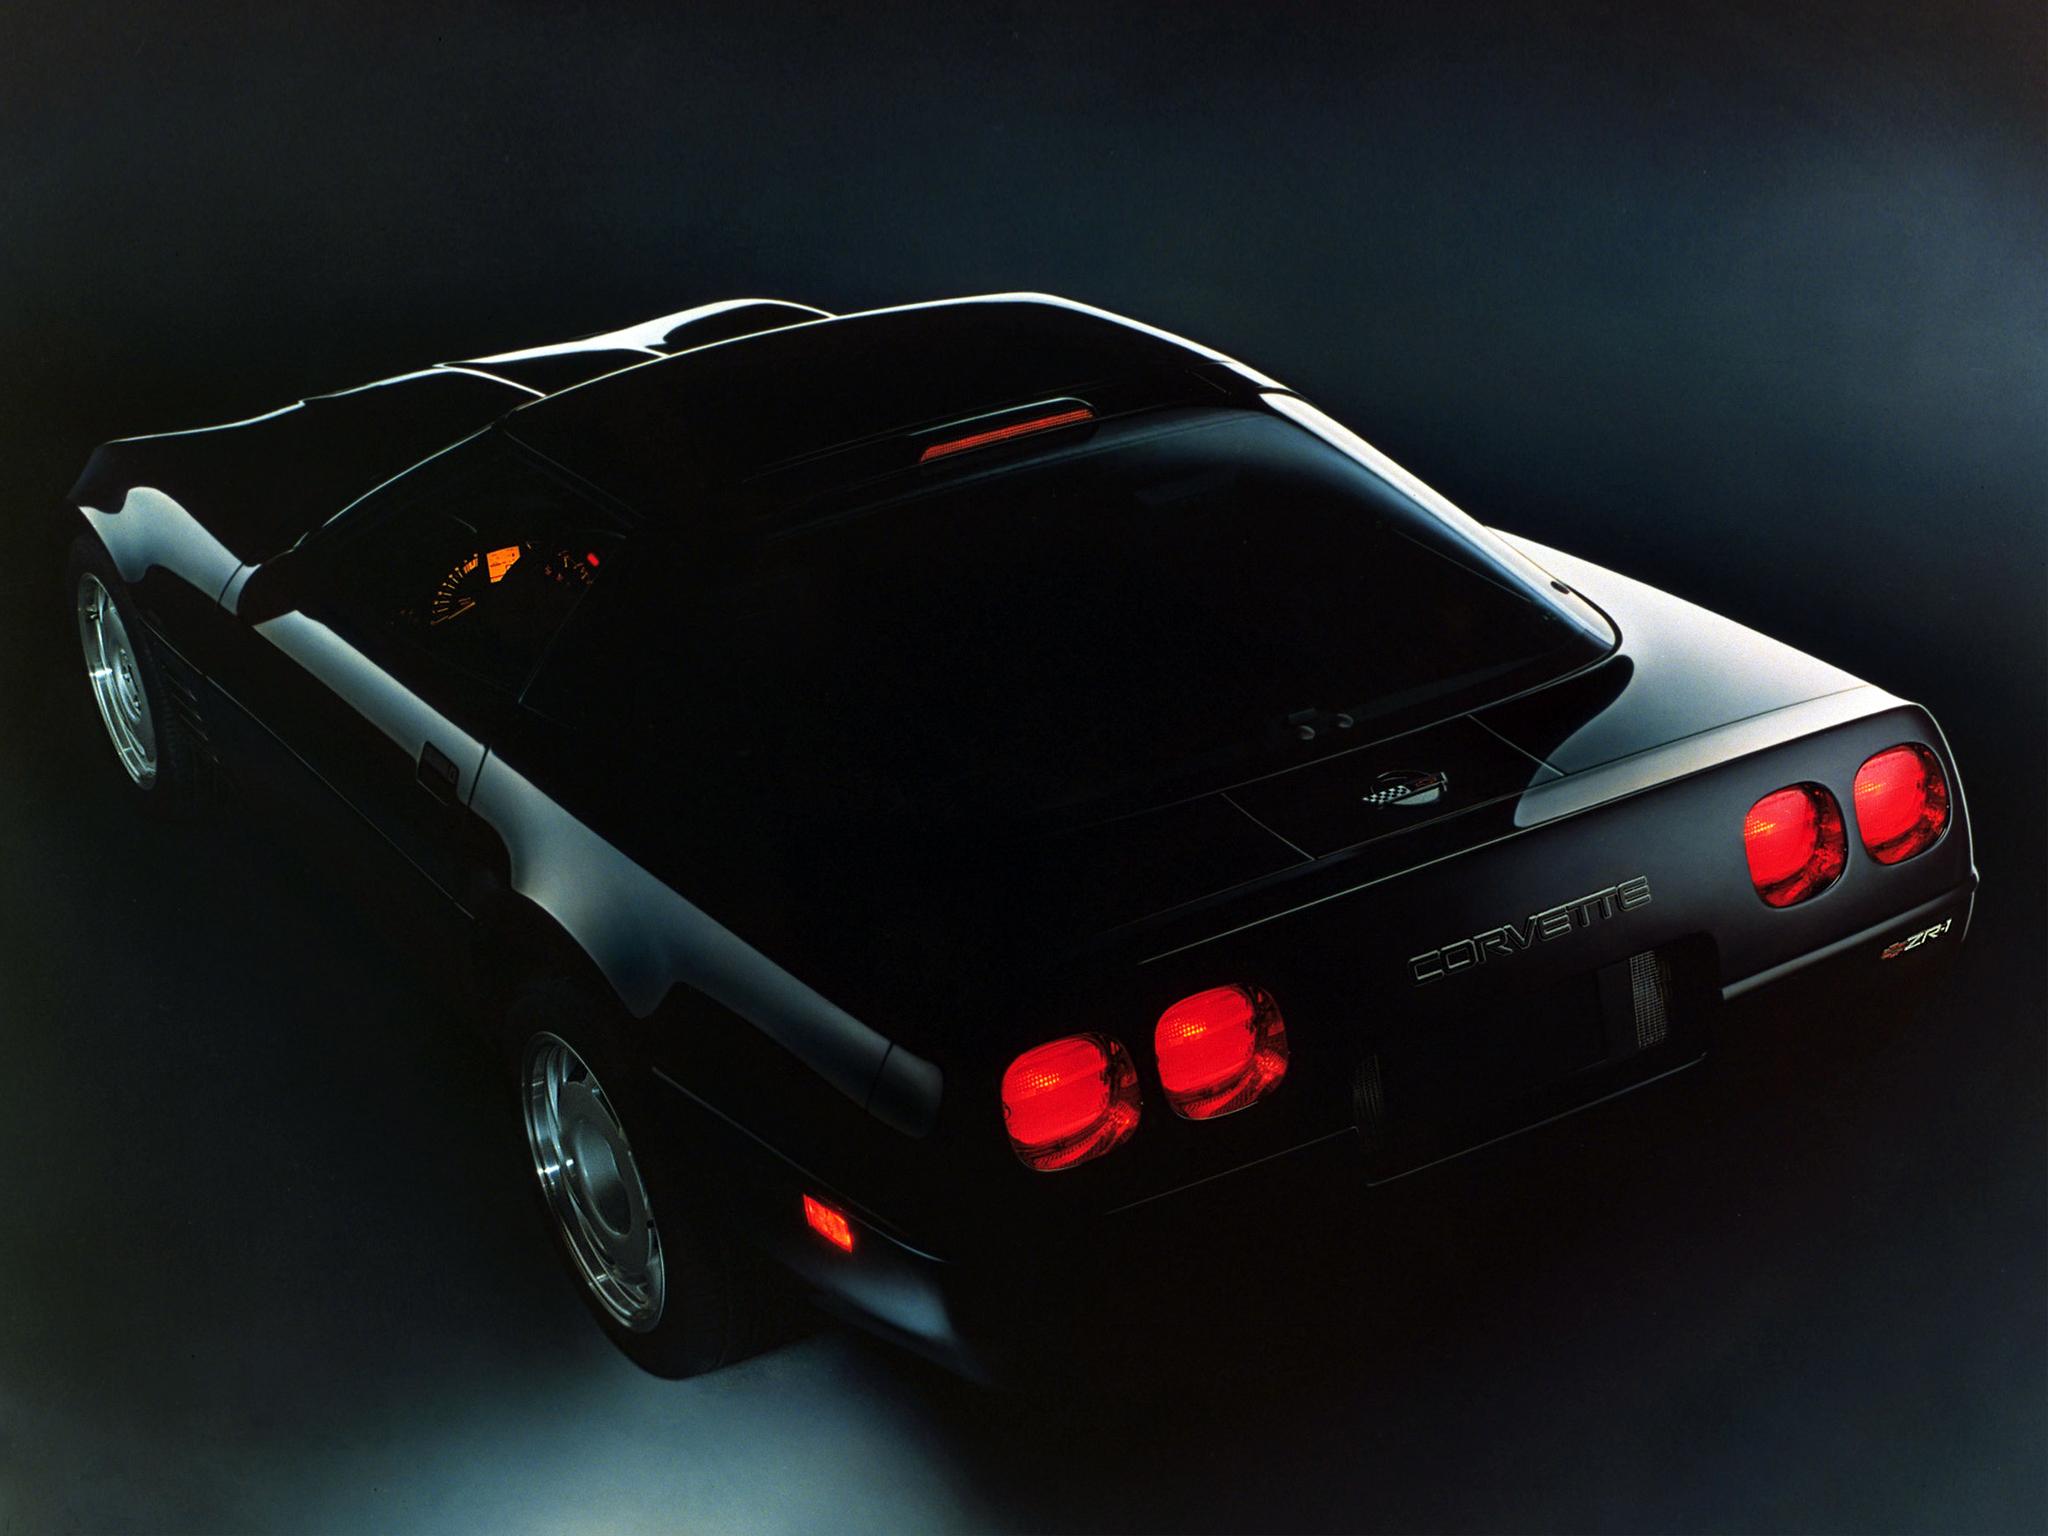 corvette_zr1_coupe_42.jpg